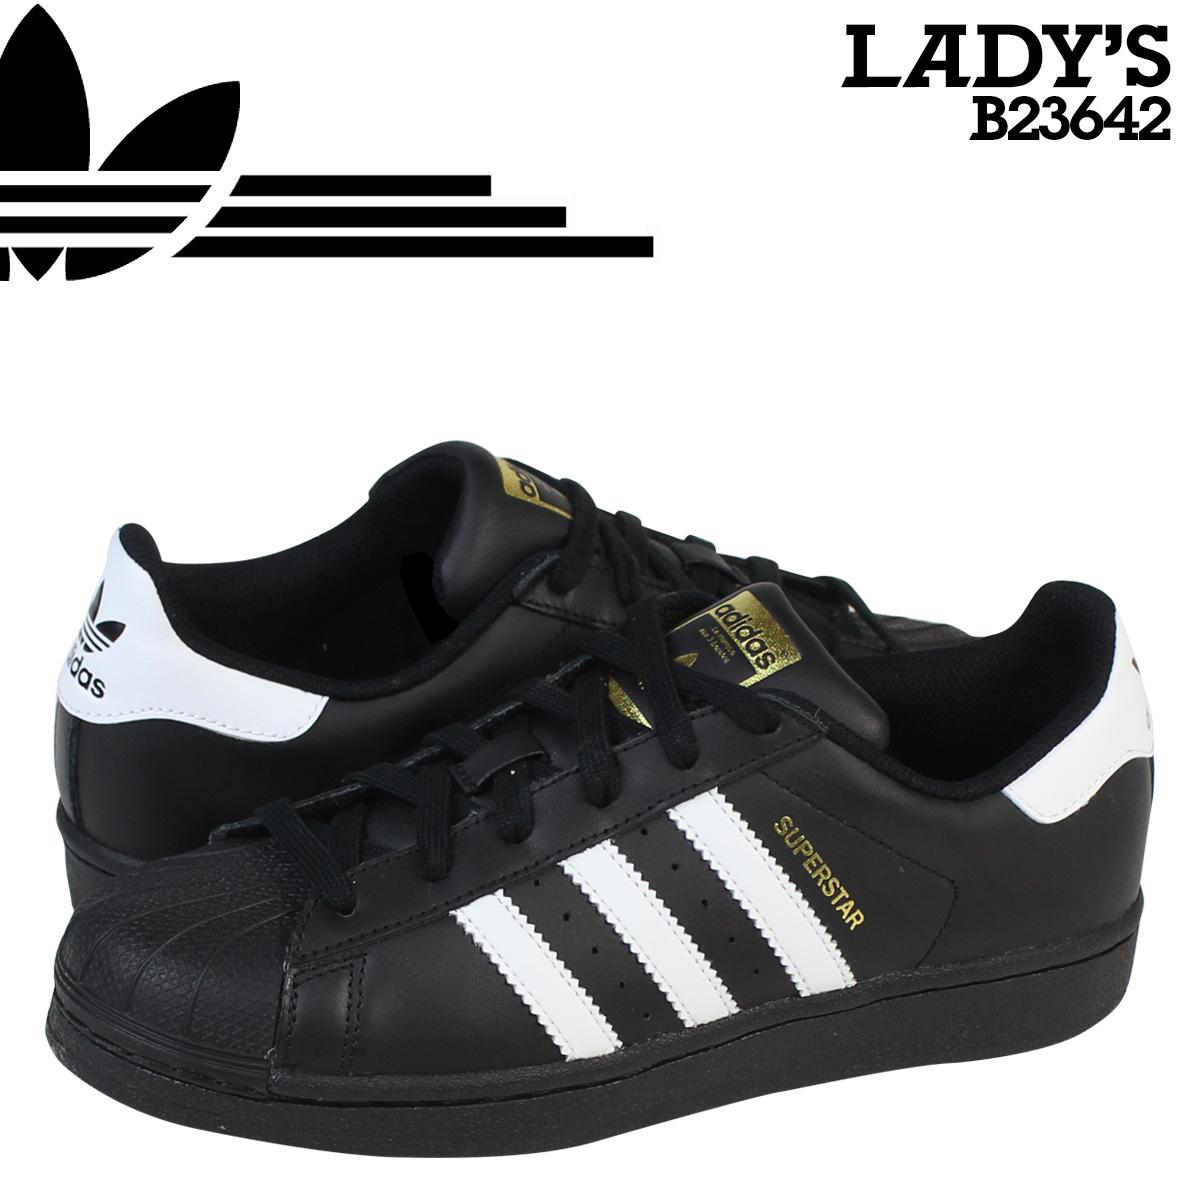 adidas original shoes price